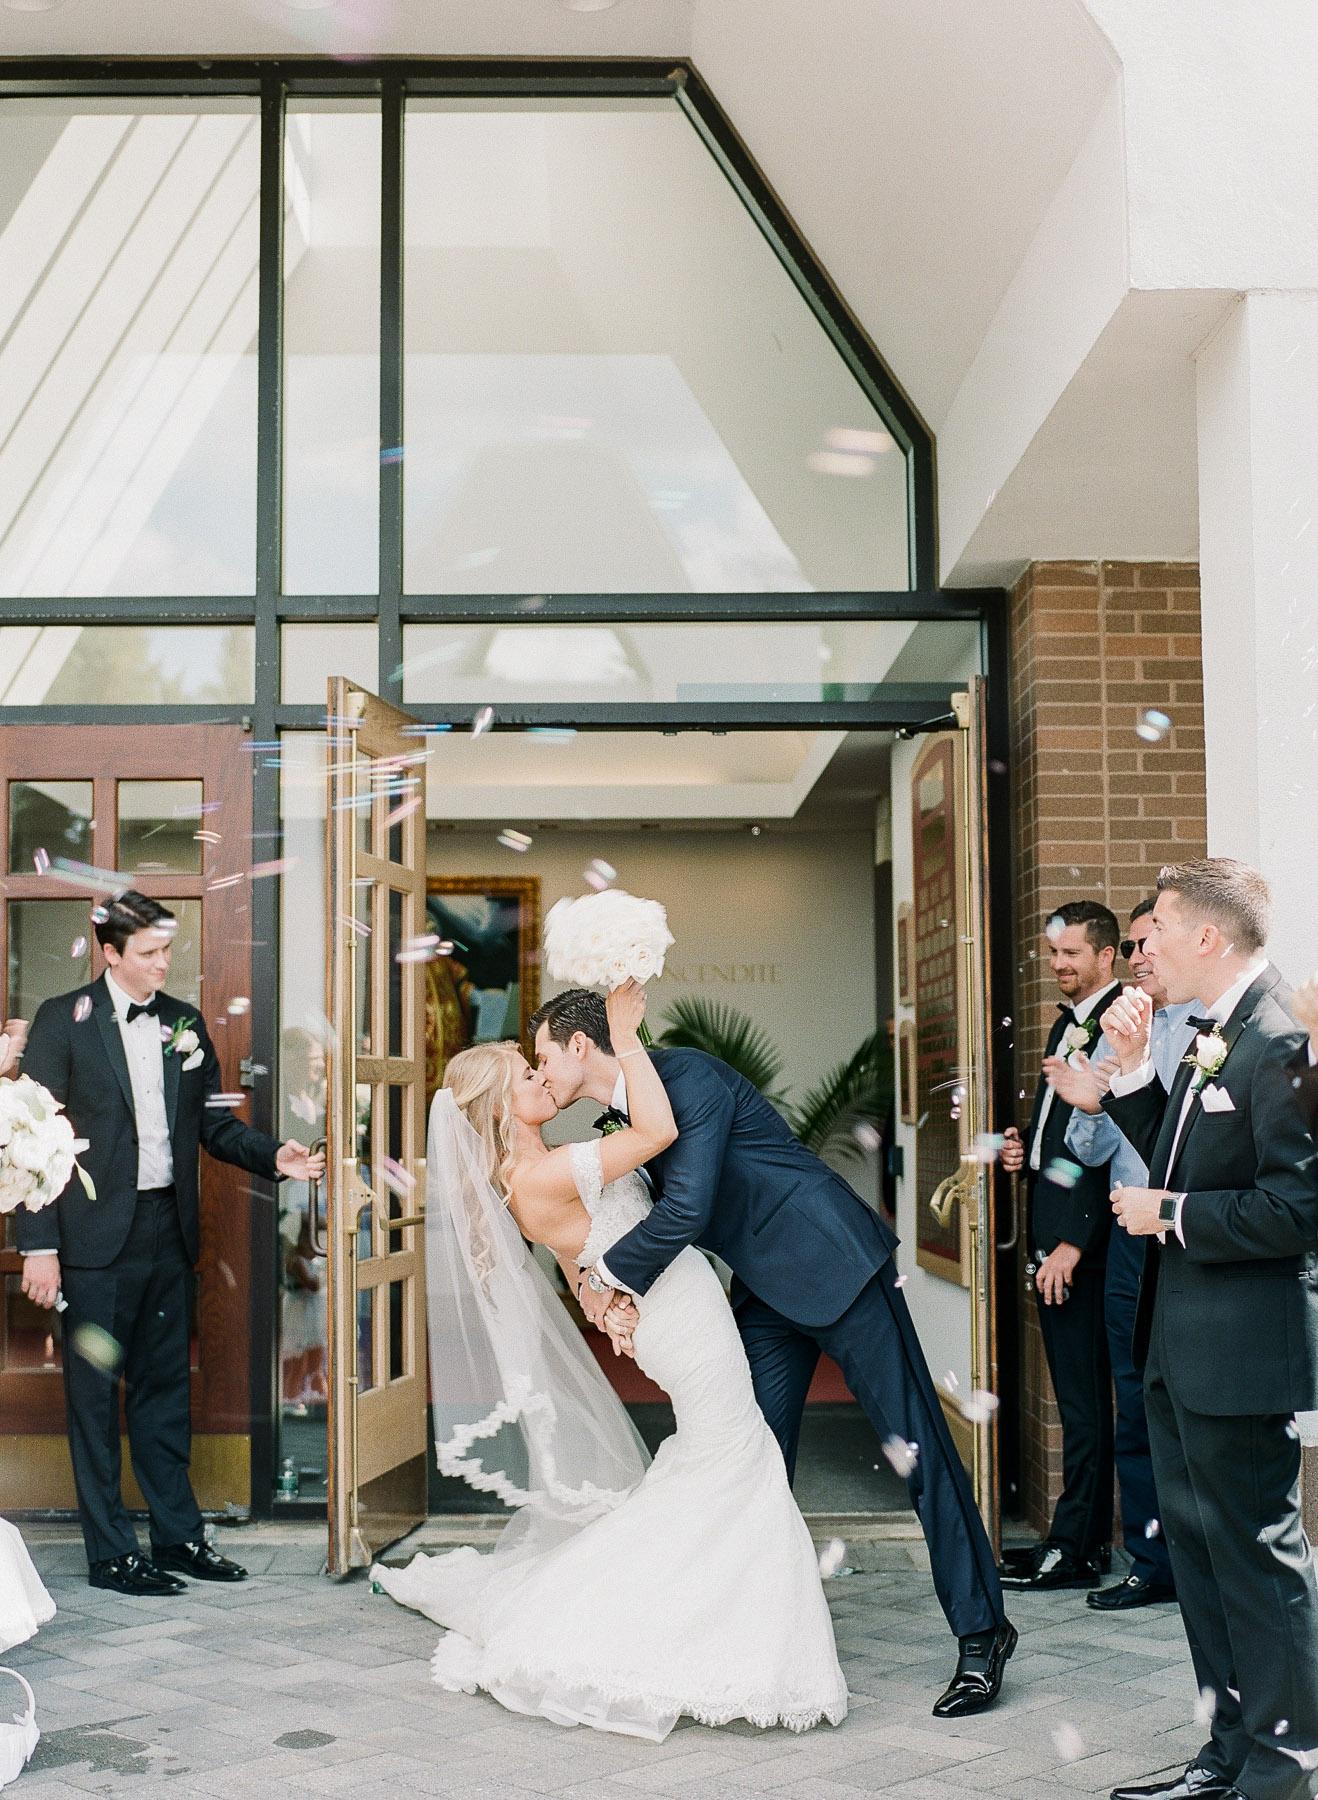 Wedding at Fairfield University Chapel Bubble Exit